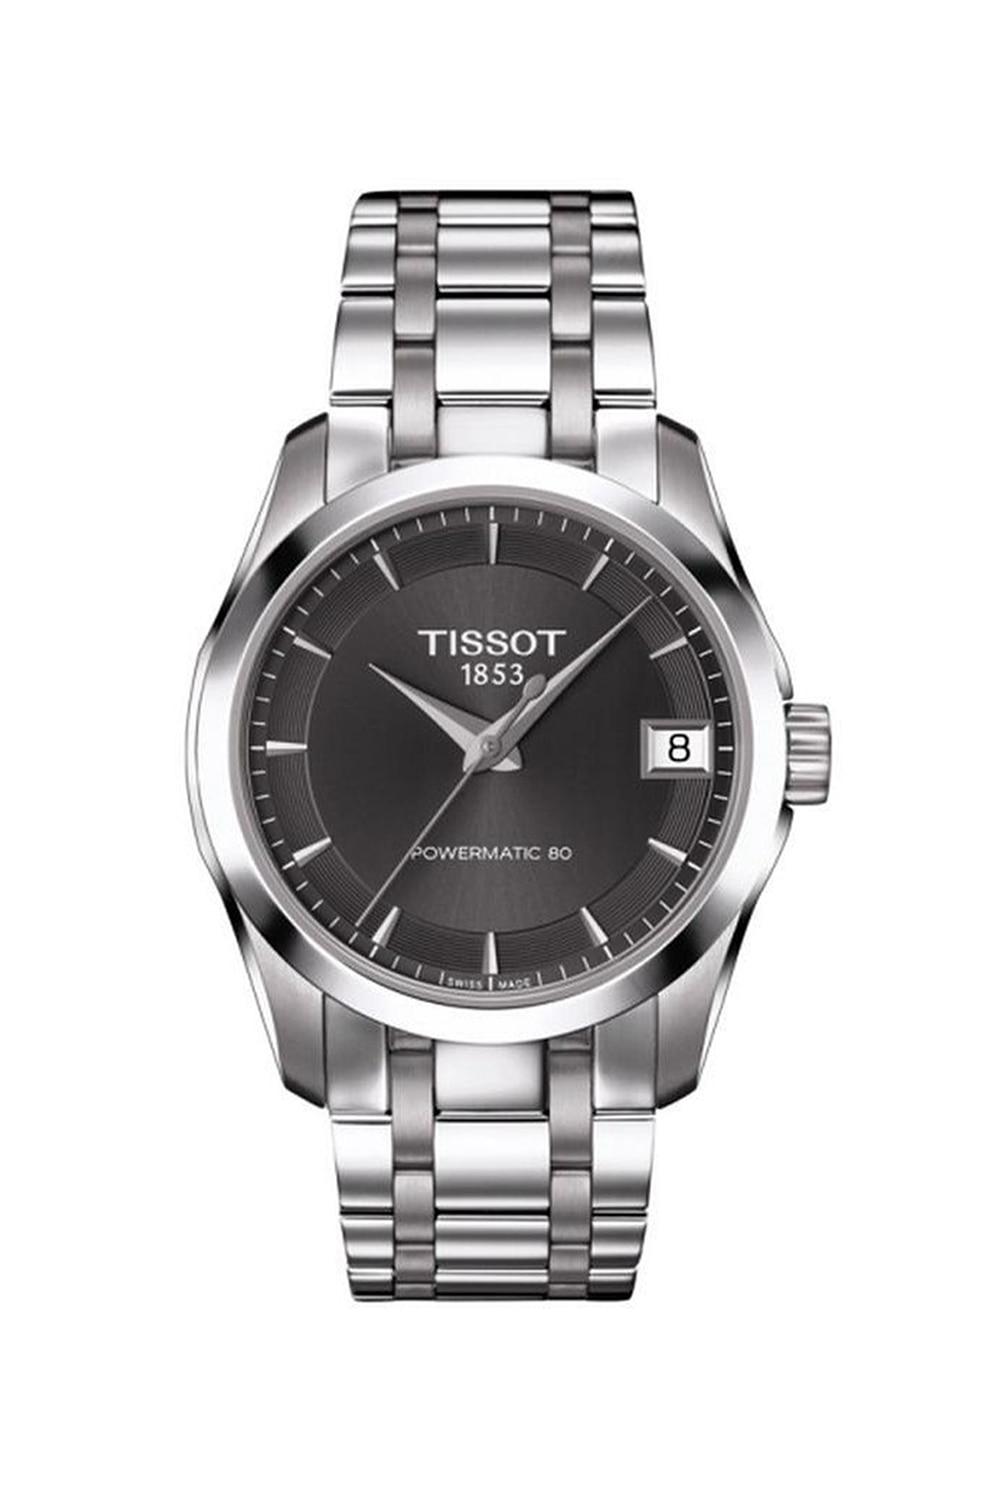 Fotografie Tissot, Ceas de otel inoxidabil Powermatic 80, Argintiu